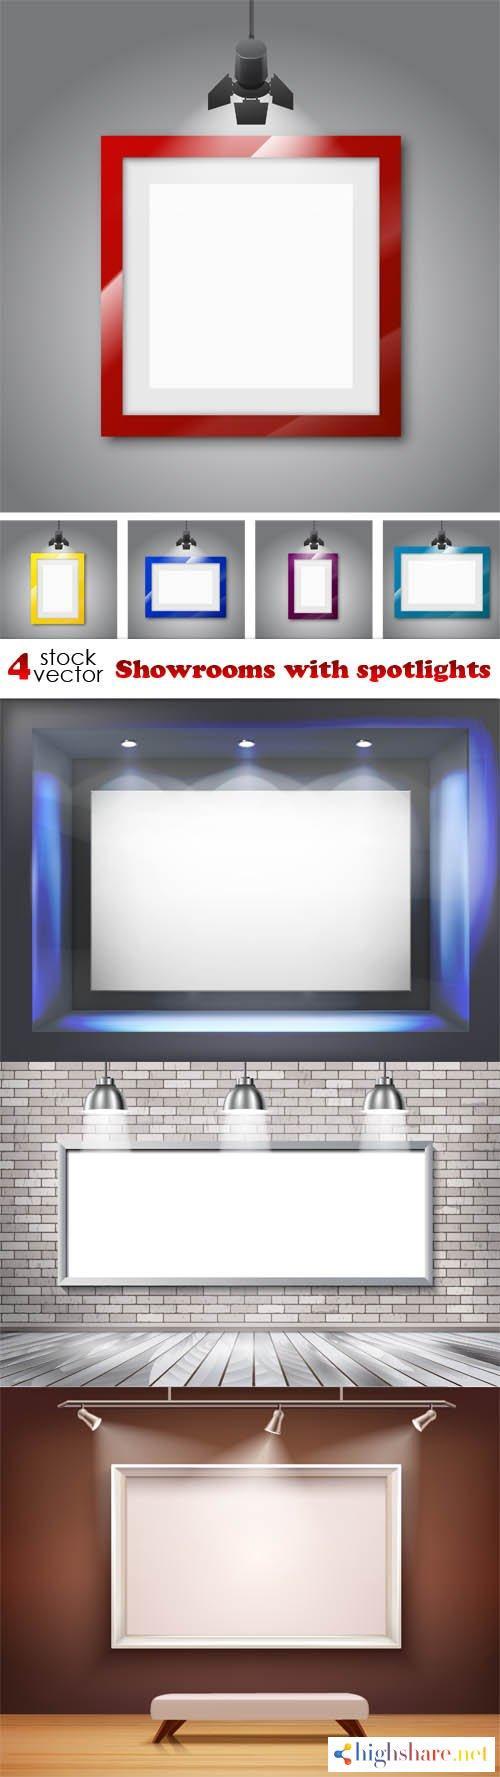 vectors showrooms with spotlights 5f3fba835397d - Vectors - Showrooms with spotlights